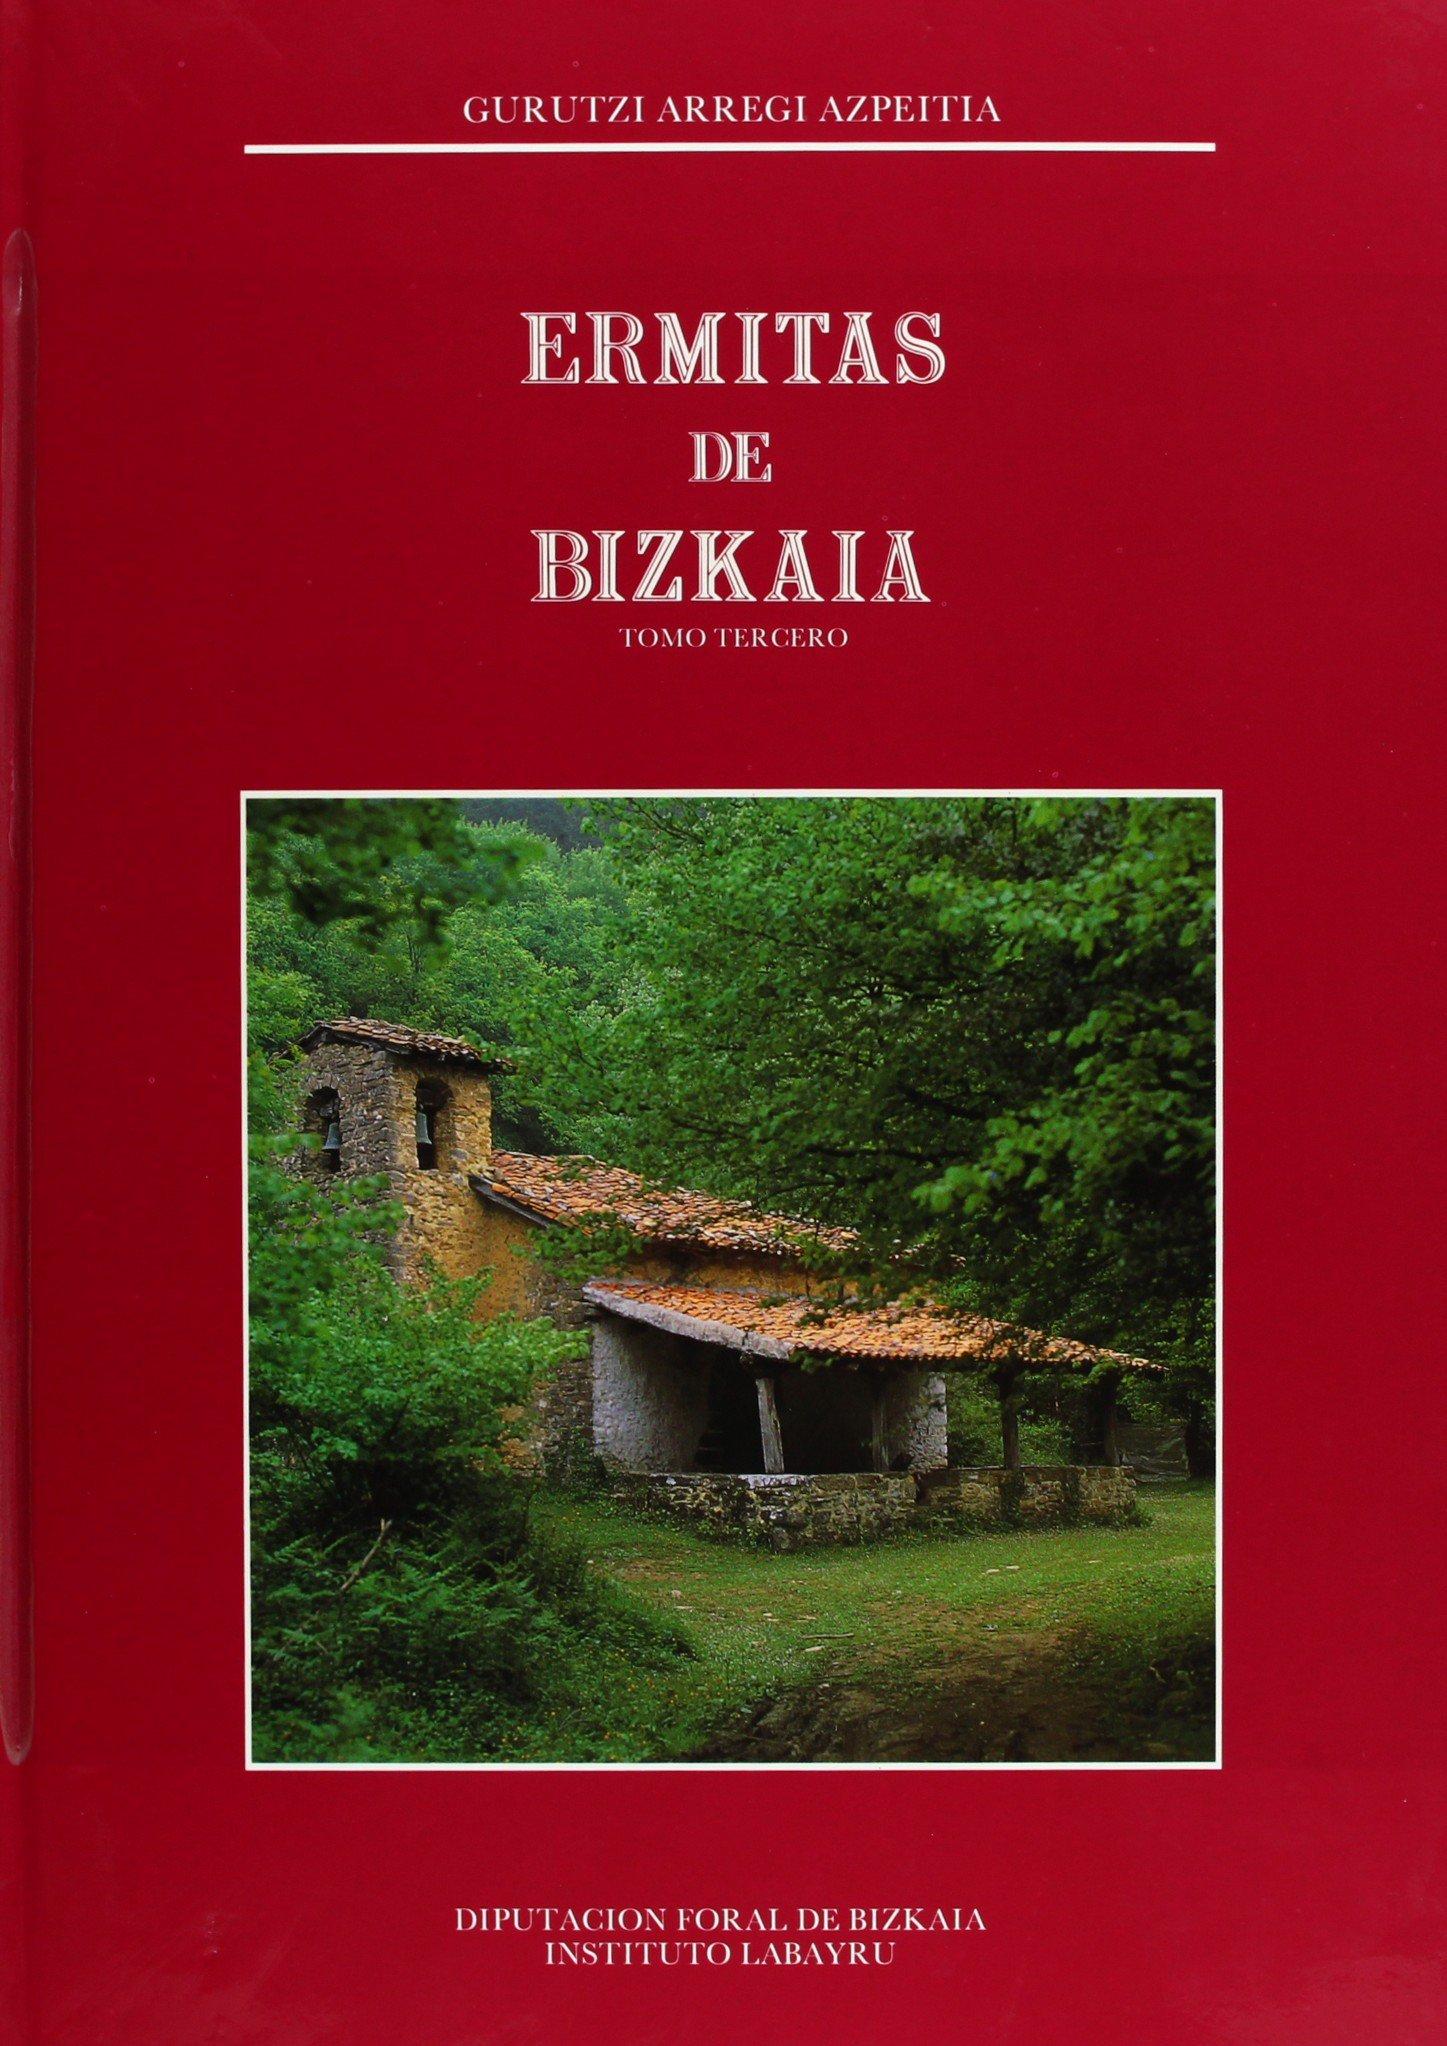 Ermitas de bizkaia vol. I,II,III Monografias Bizkaia: Amazon.es ...